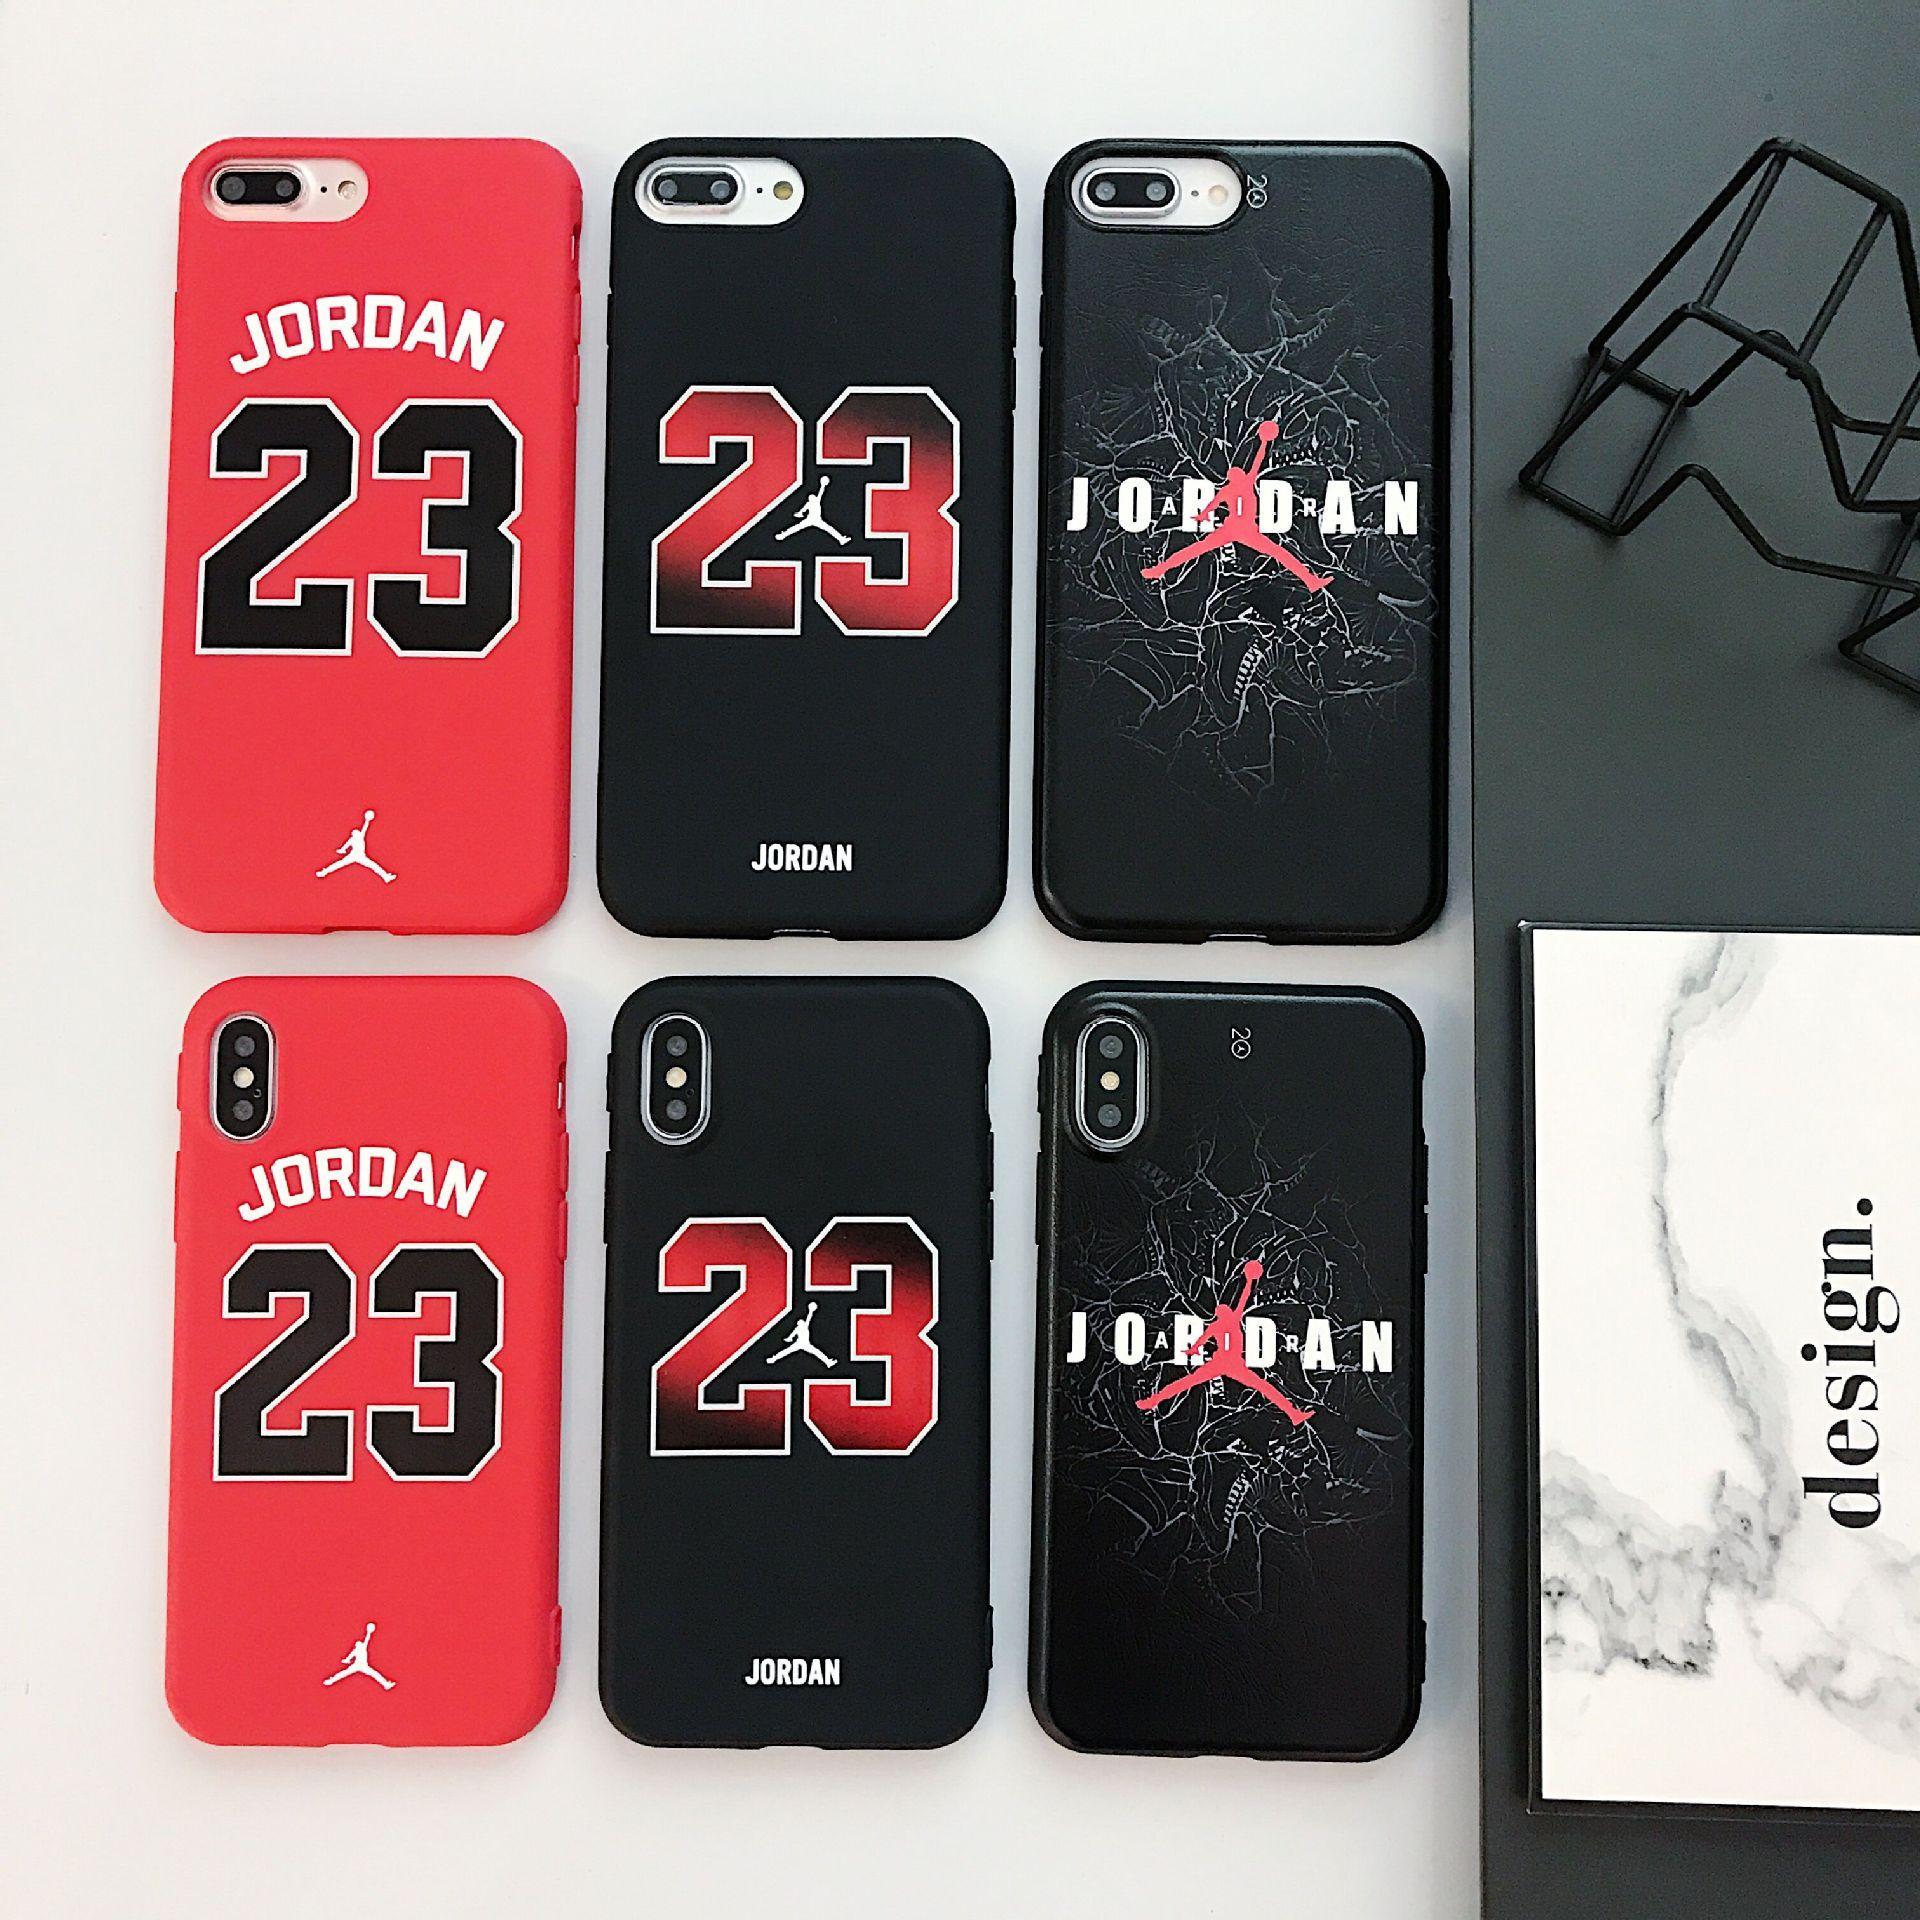 jersey designer phone case for iphone x 6 6s 6plus 7 8 7plus 8plusbest dog mobile phone case cheap g3 phone cases